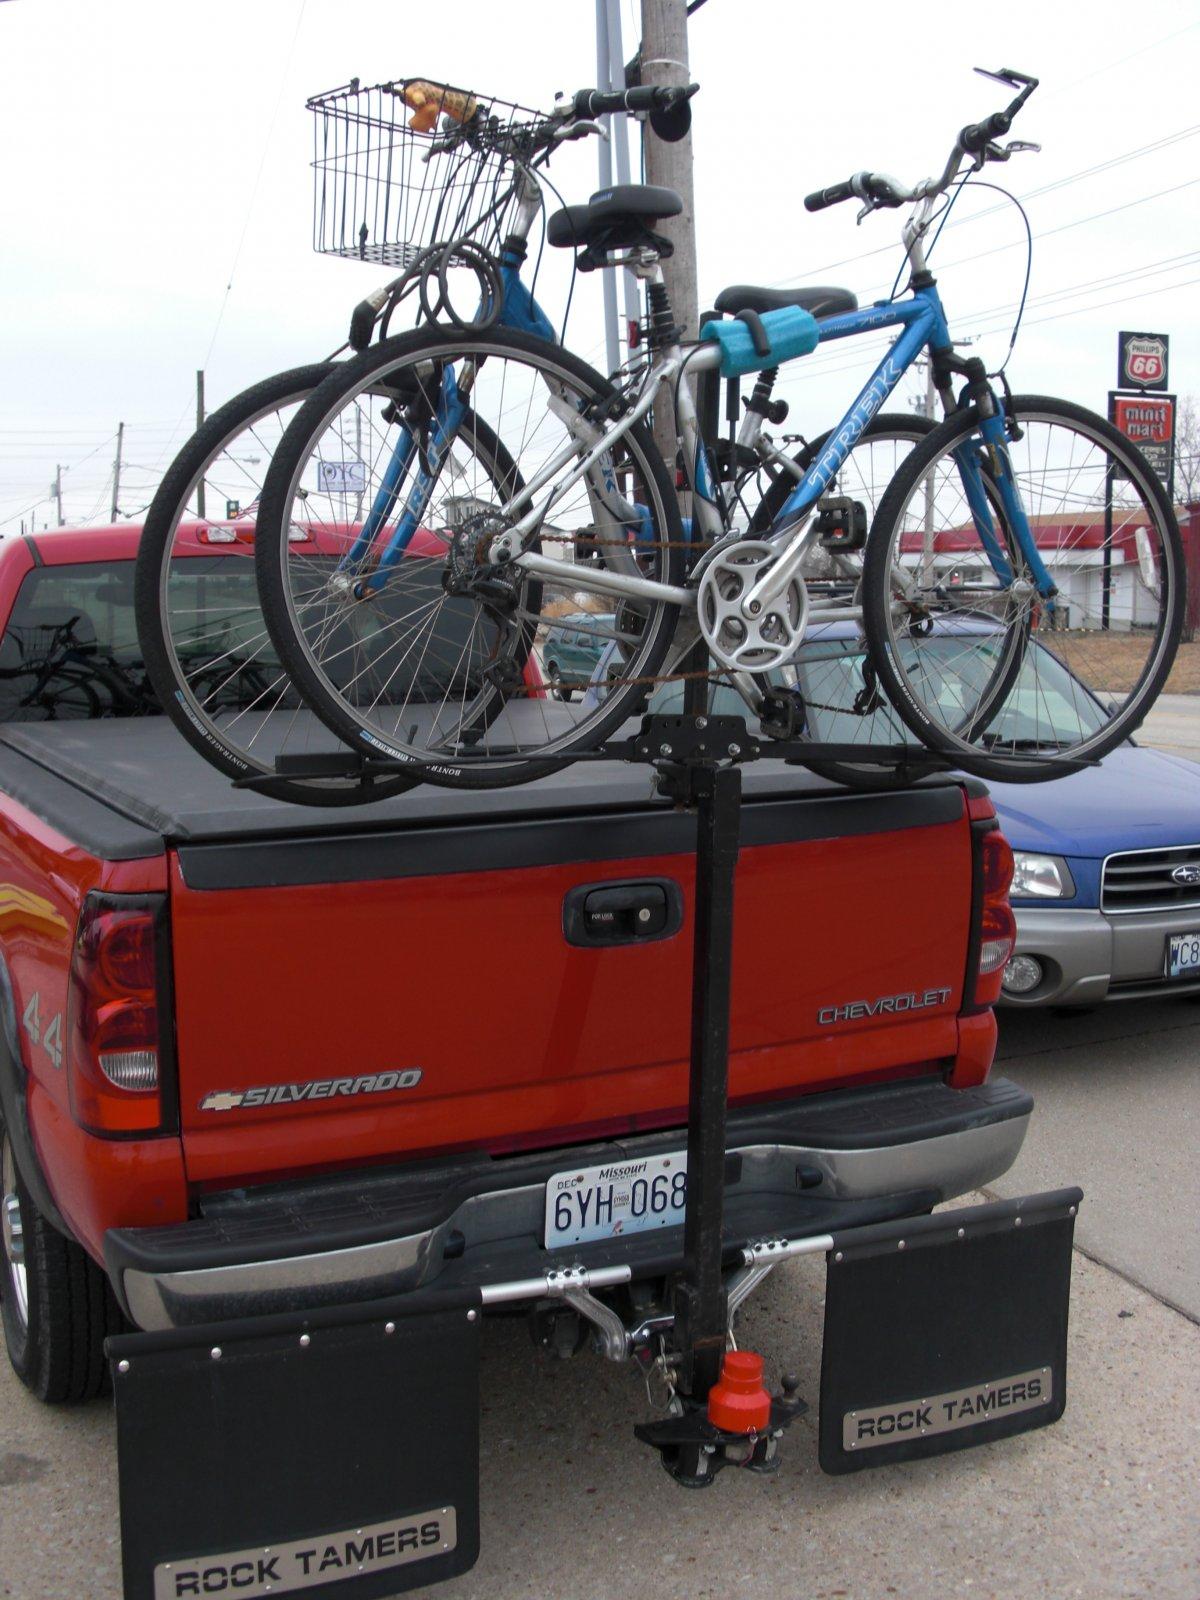 Click image for larger version  Name:Bike Rack.jpg Views:52 Size:288.2 KB ID:97793